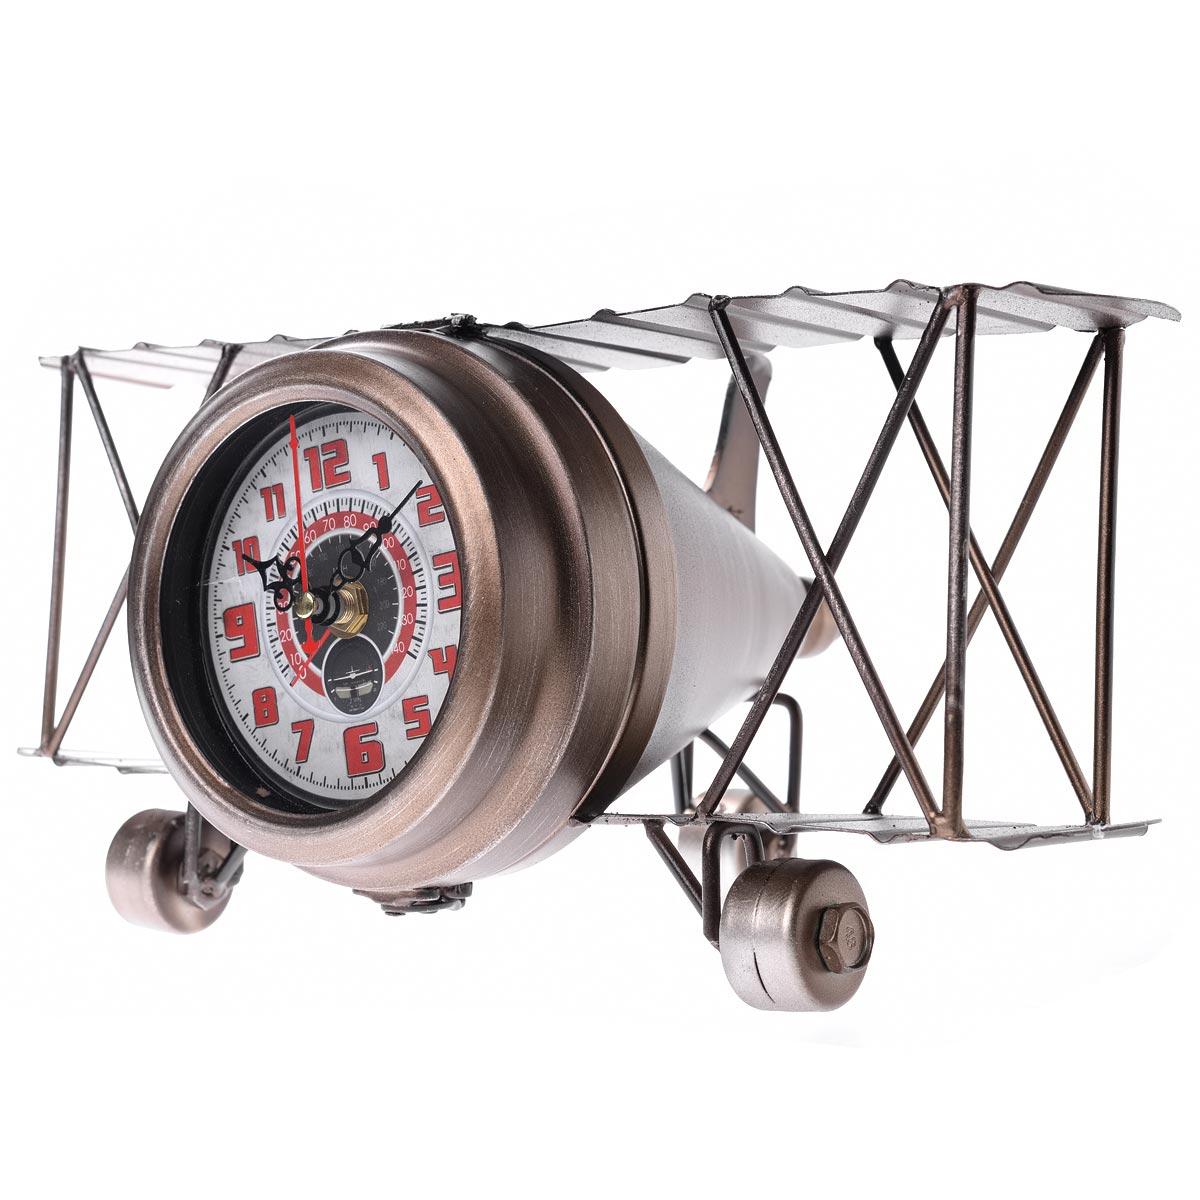 Vintage χειροποίητο διακοσμητικό ρολόι - αεροπλάνο μεταλλικό - OEM 52732